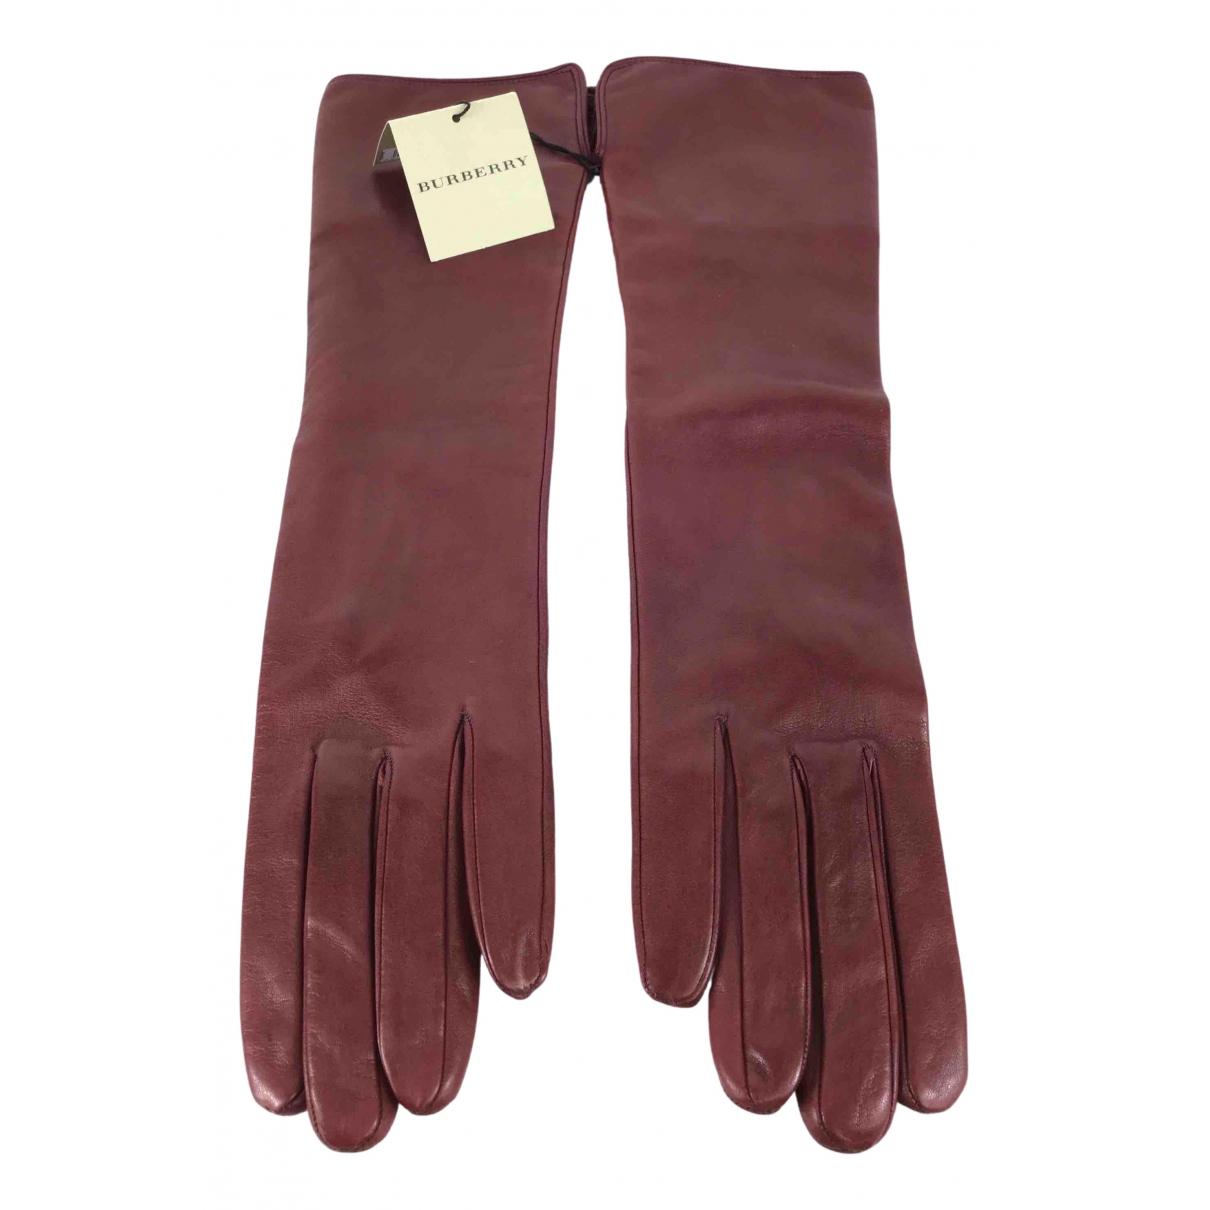 Burberry N Burgundy Leather Gloves for Women M International